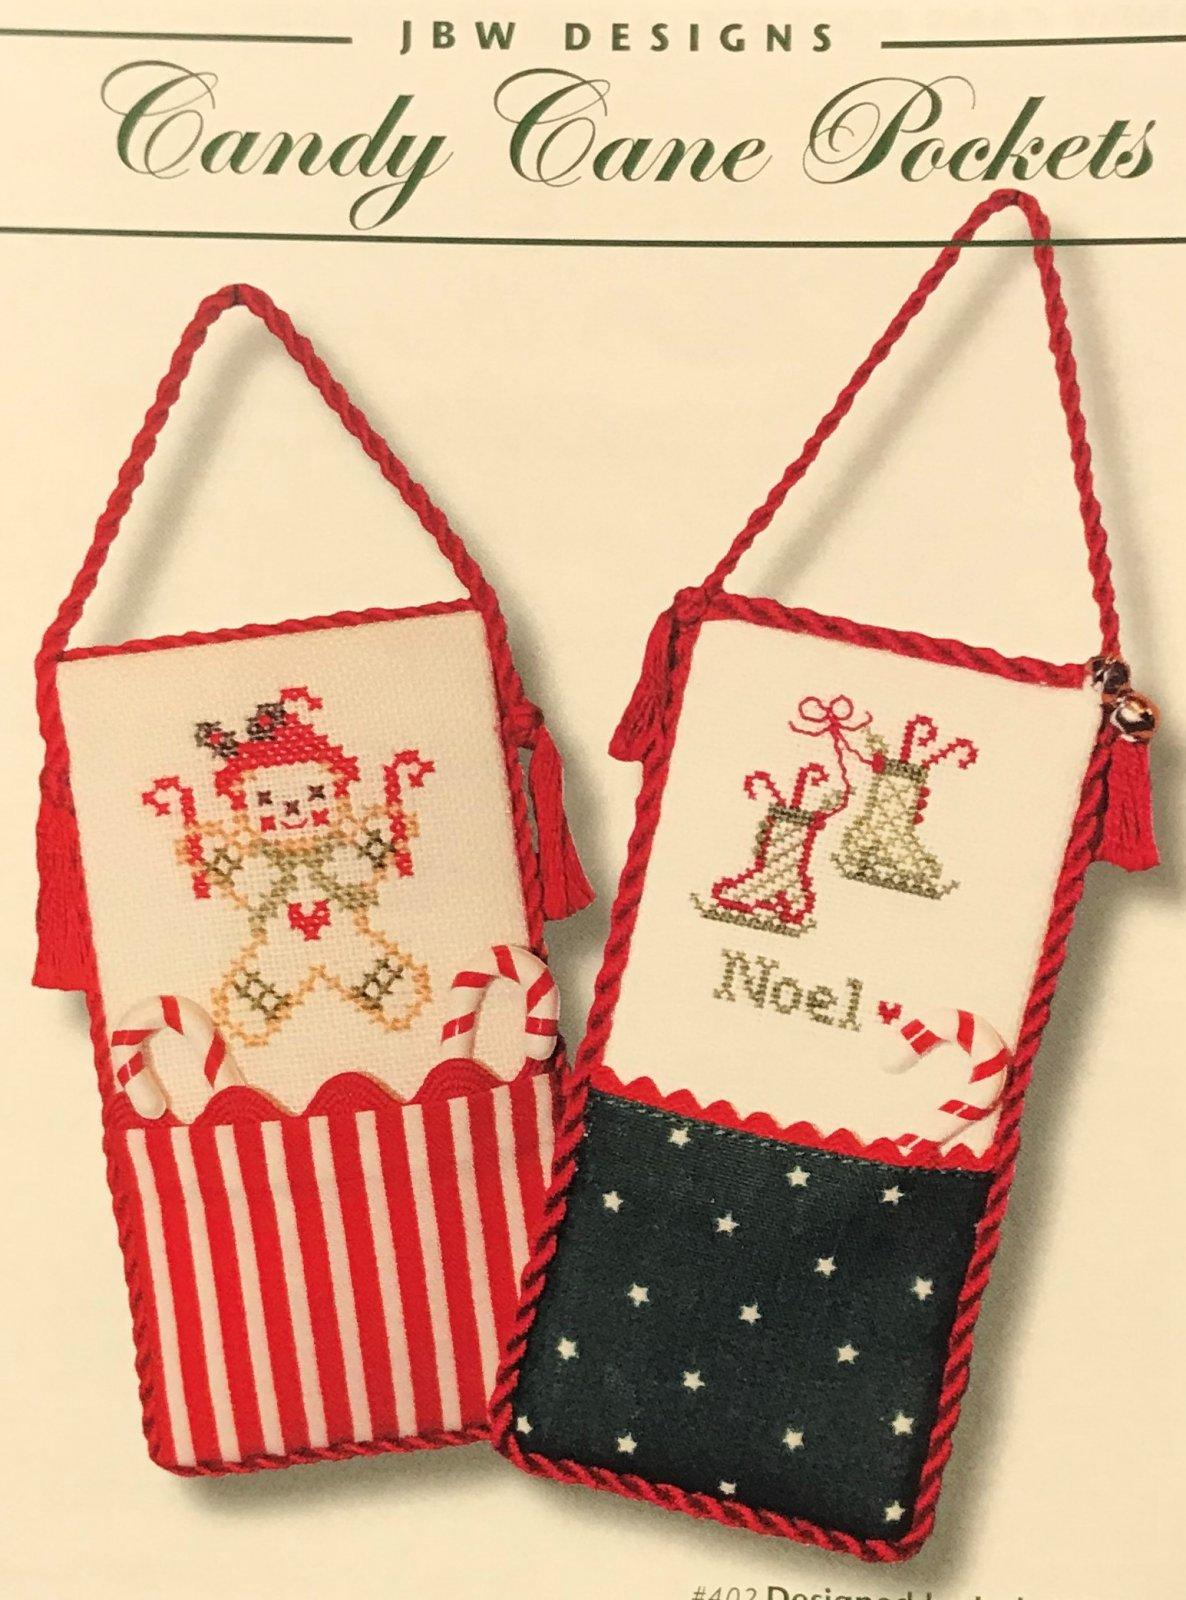 Candy Cane Pockets